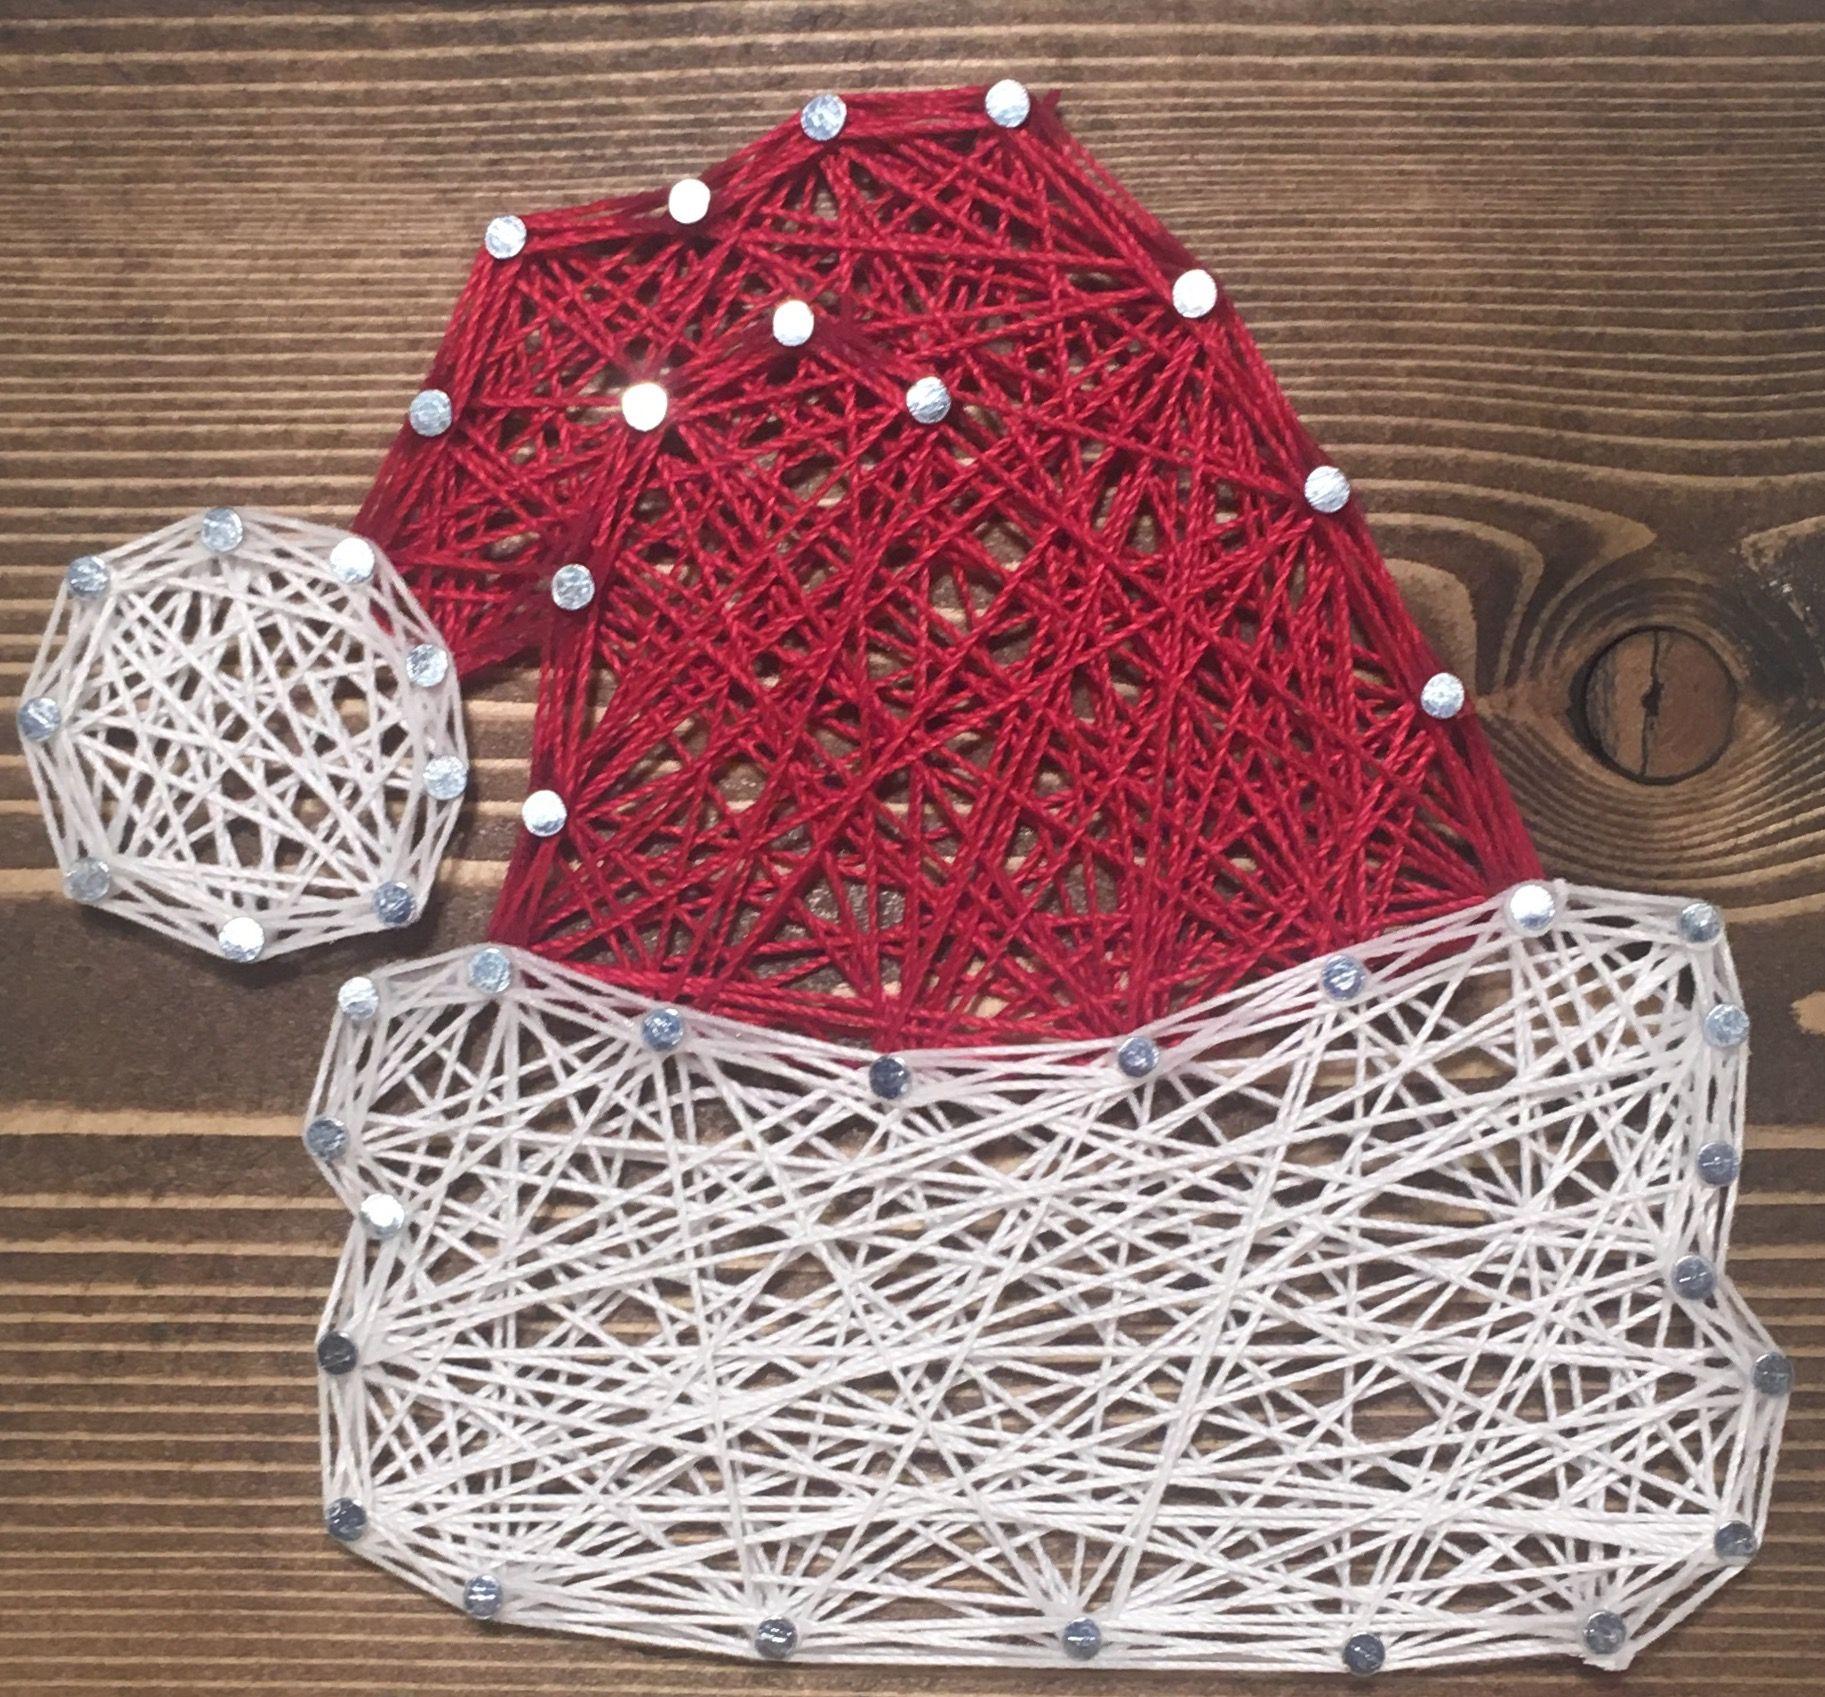 Santa Claus Hat String Art, Christmas Decor Order From Kiwistrings